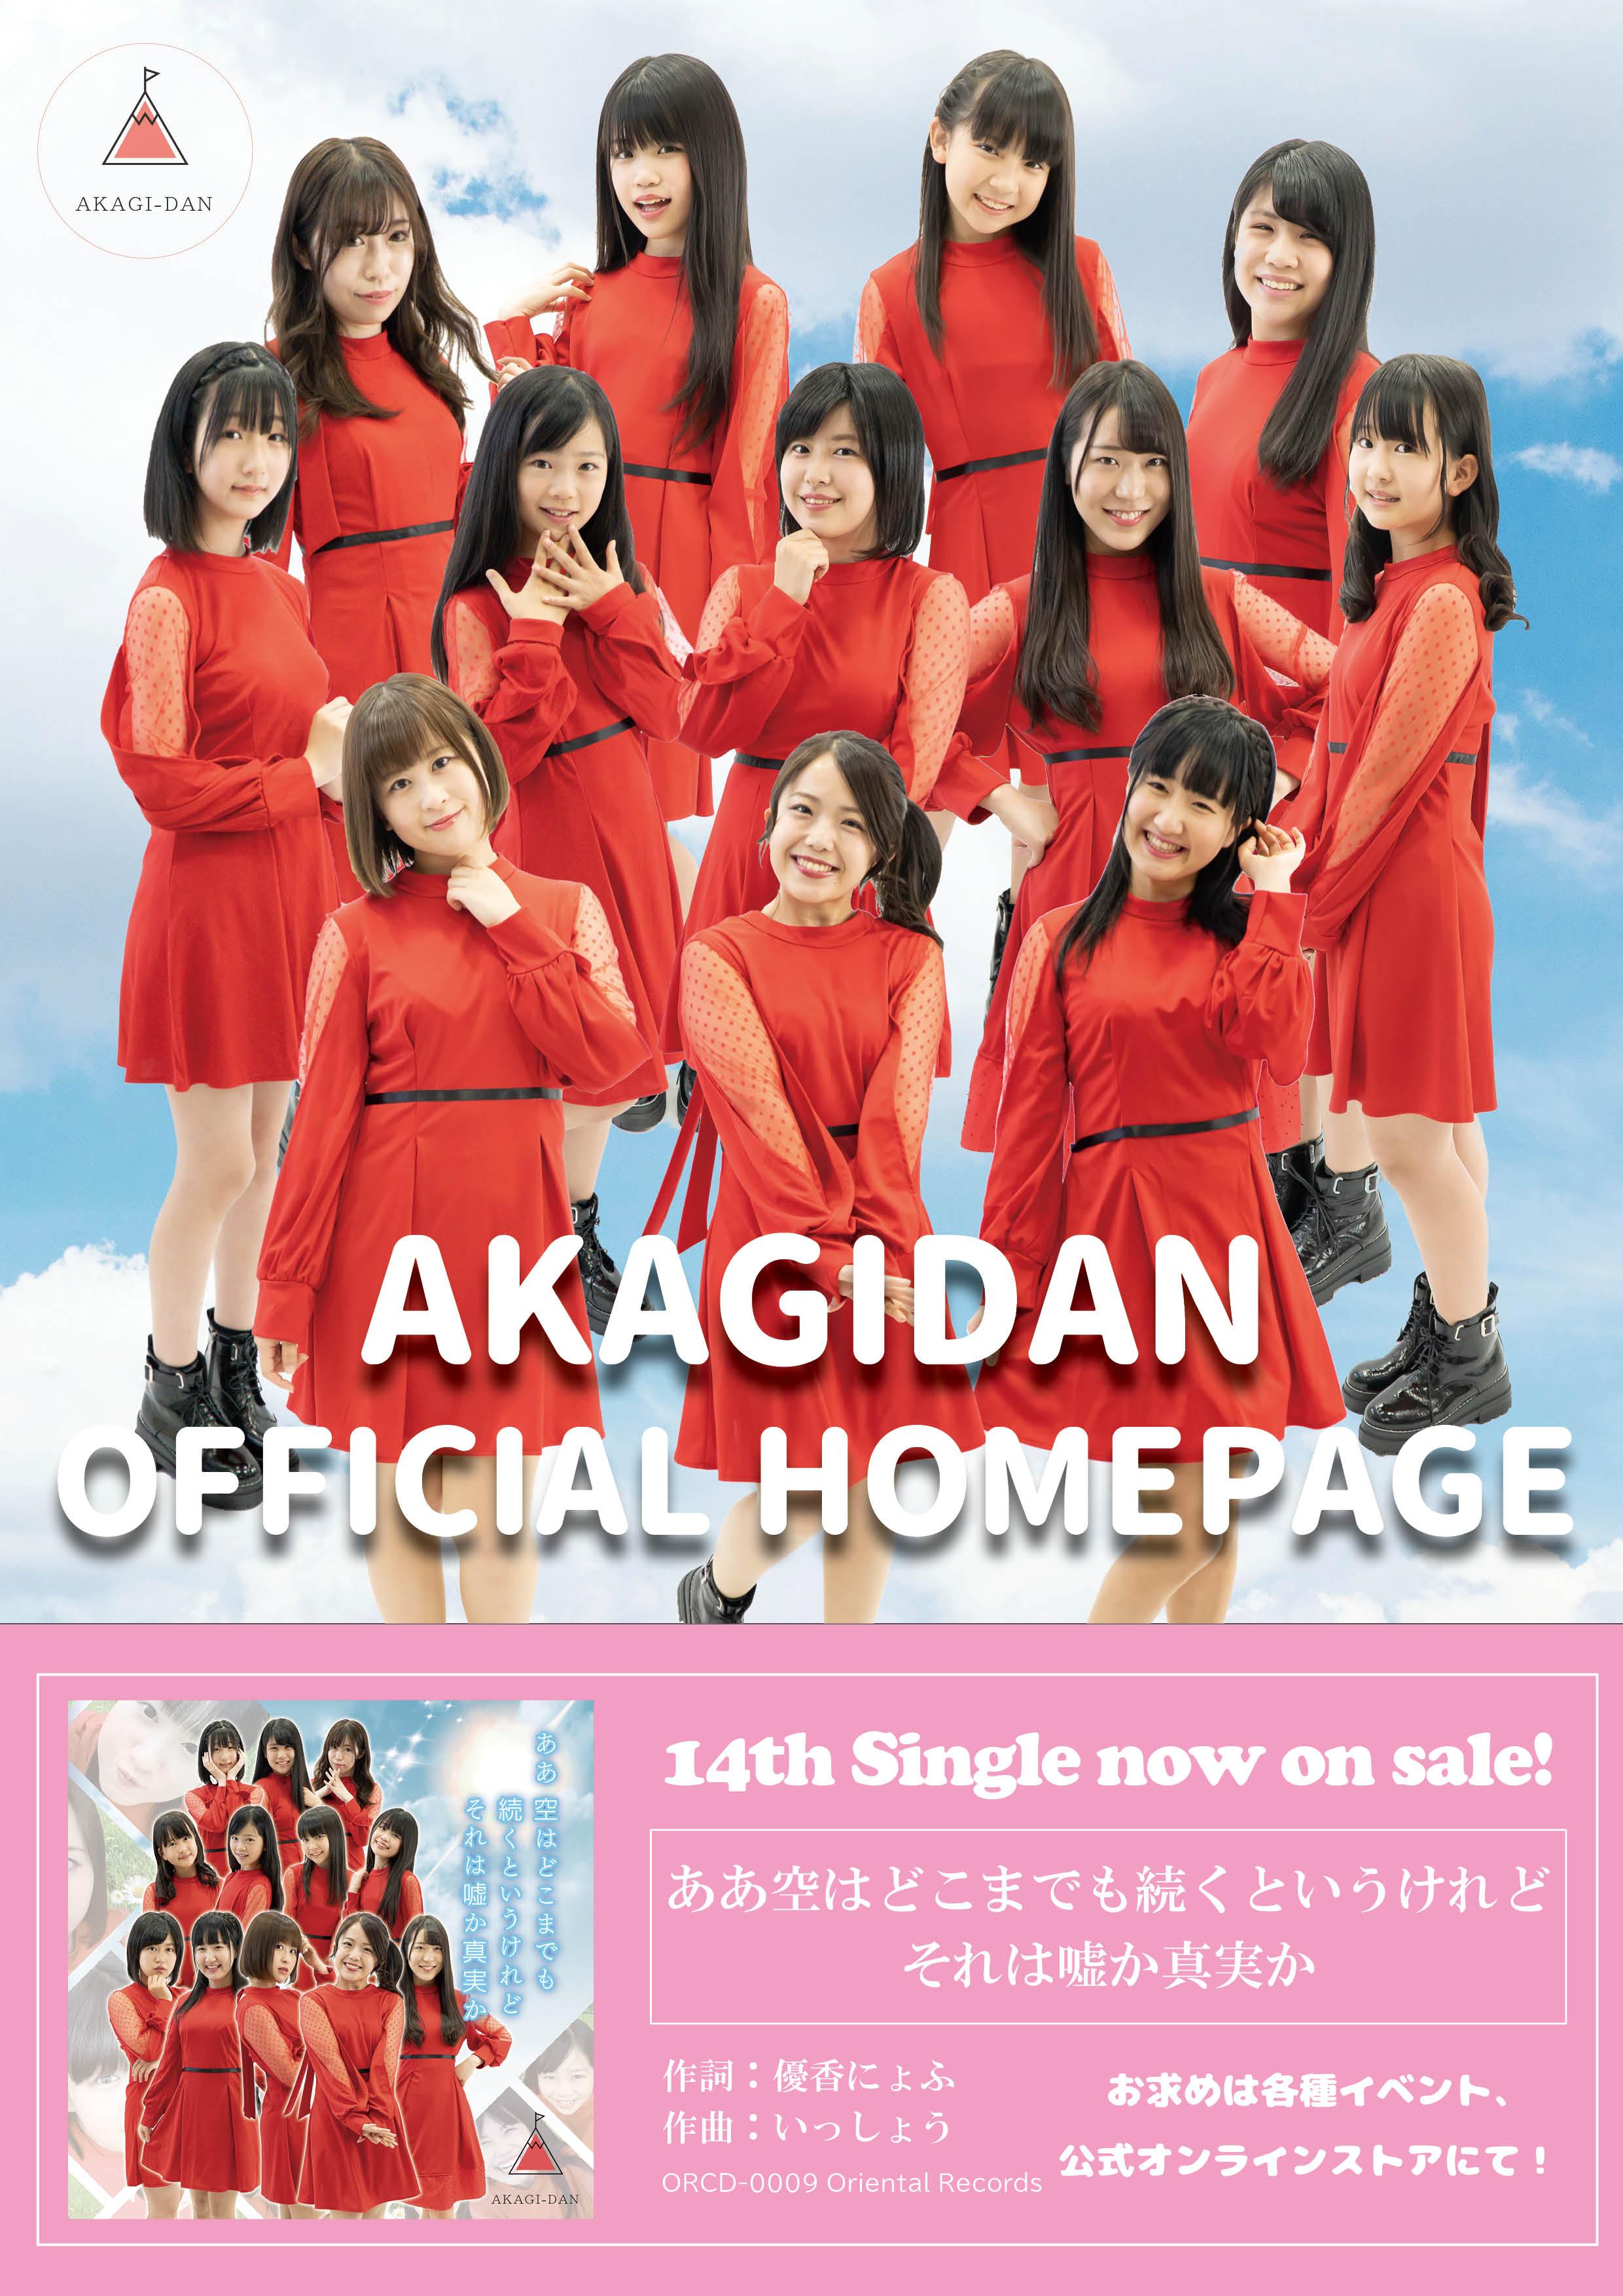 AKG AKAGIDAN official homepage